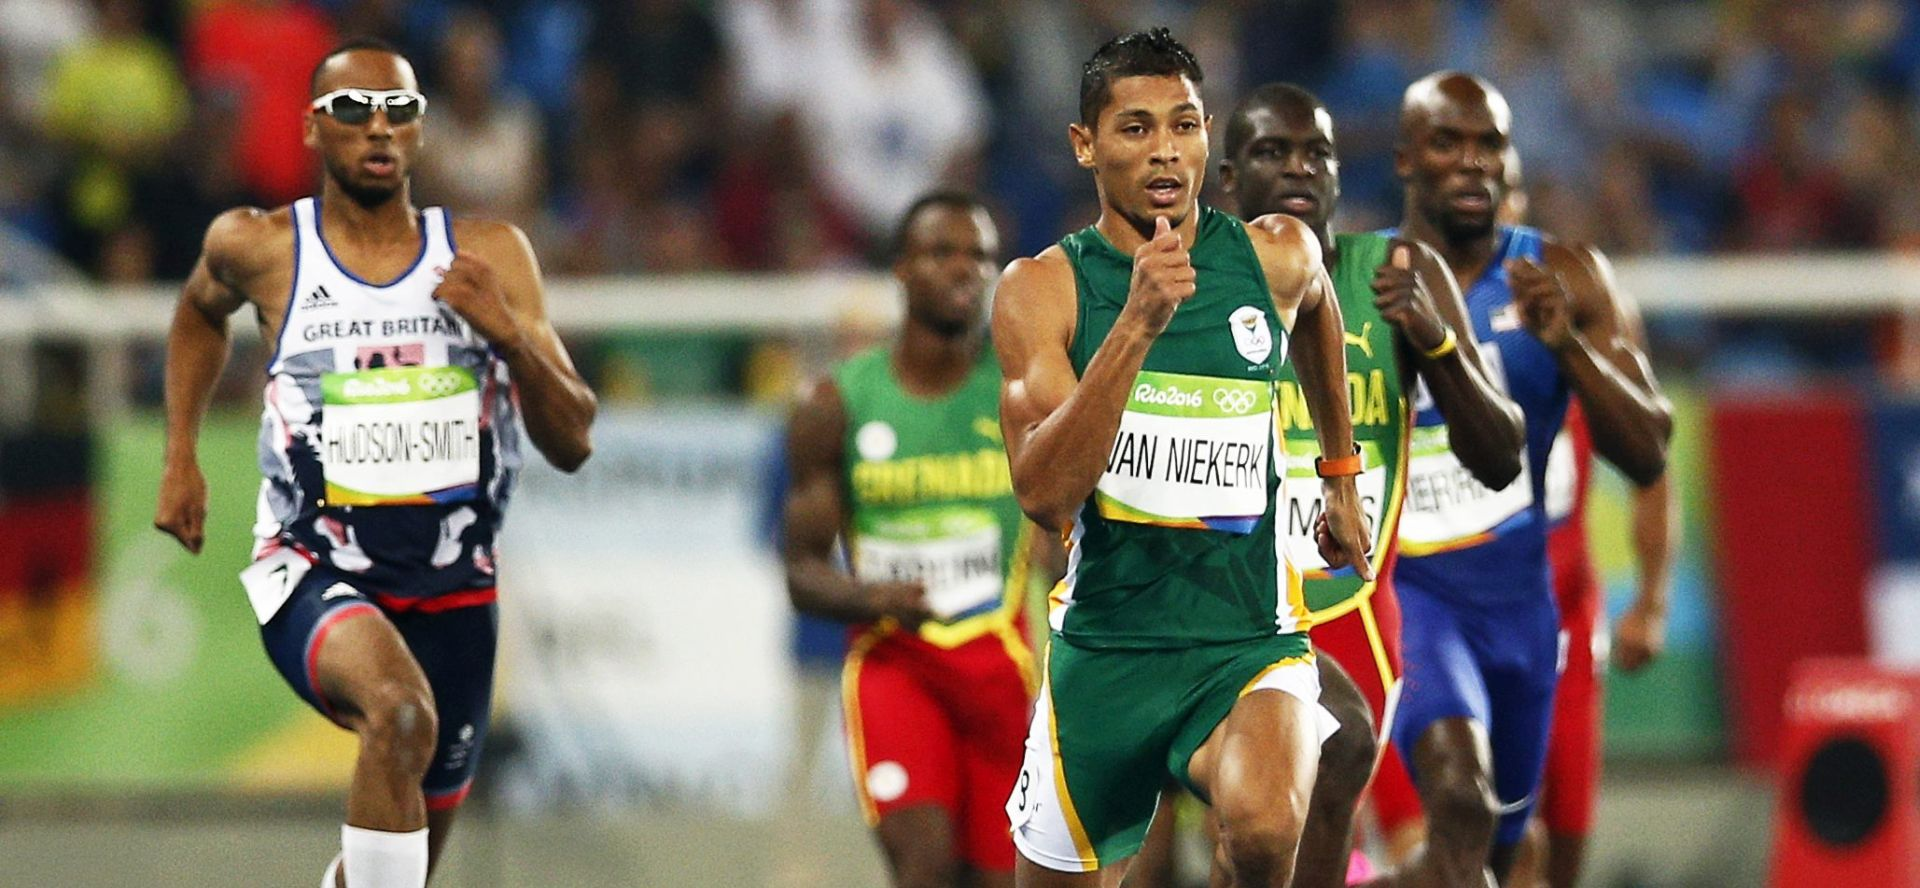 VIDEO: OI ATLETIKA Južnoafrikanac 'srušio' 17 godina star rekord na 400 metara